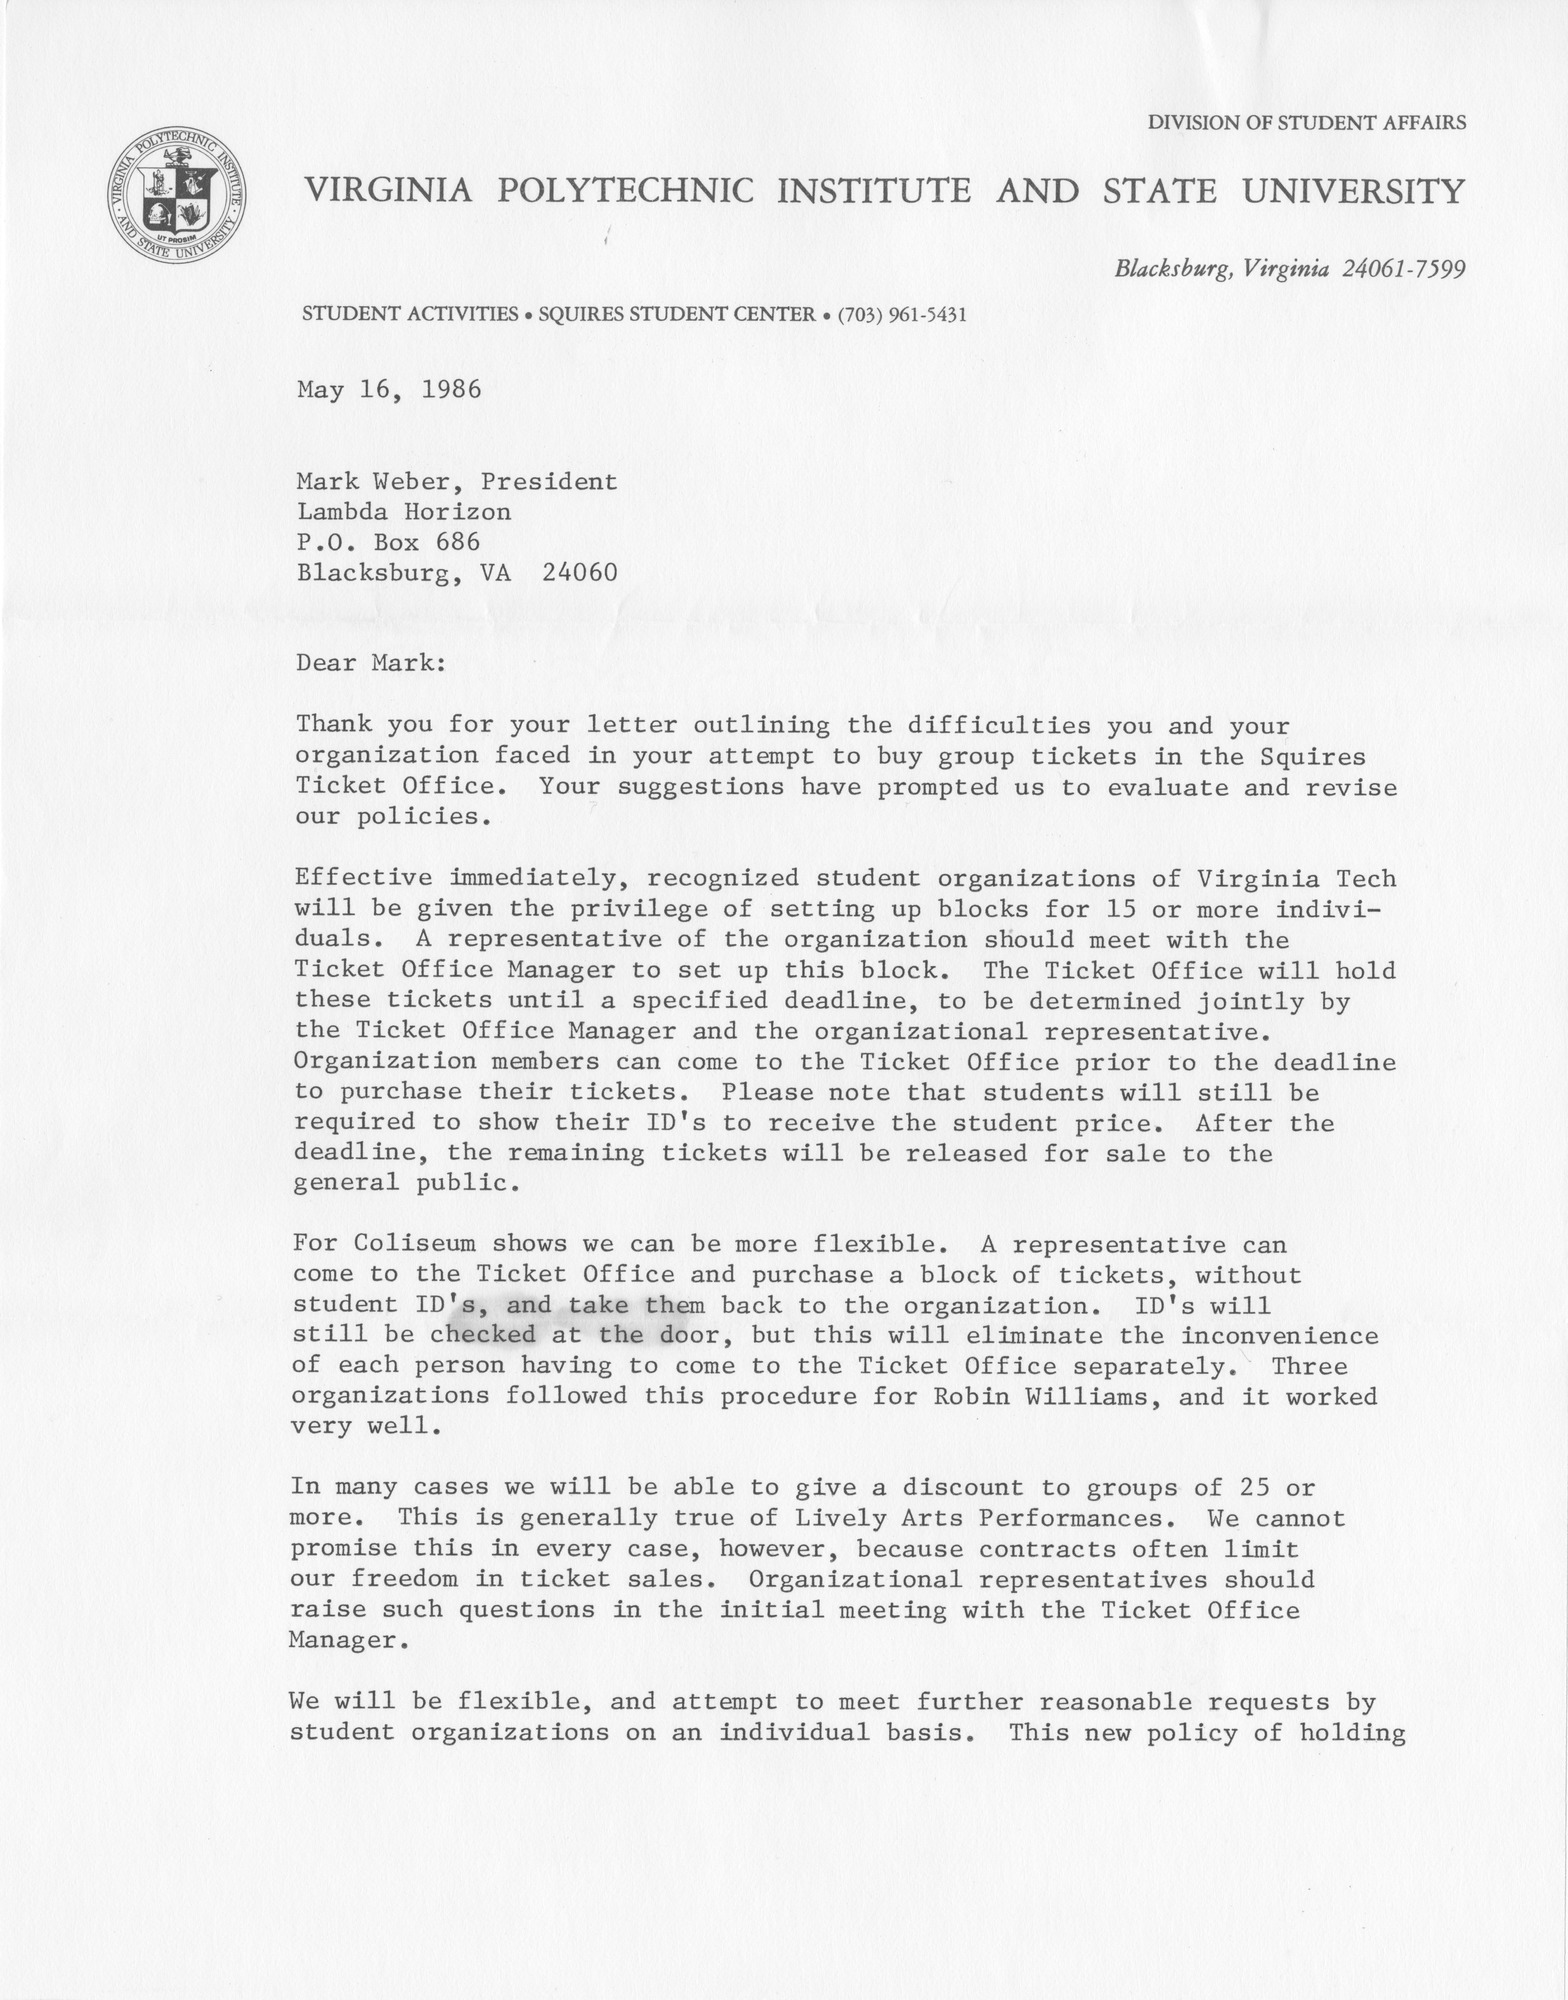 Ms2014-010_WeberMark_CorrespondenceSquiresStudentCenter_1986_0516a.jpg